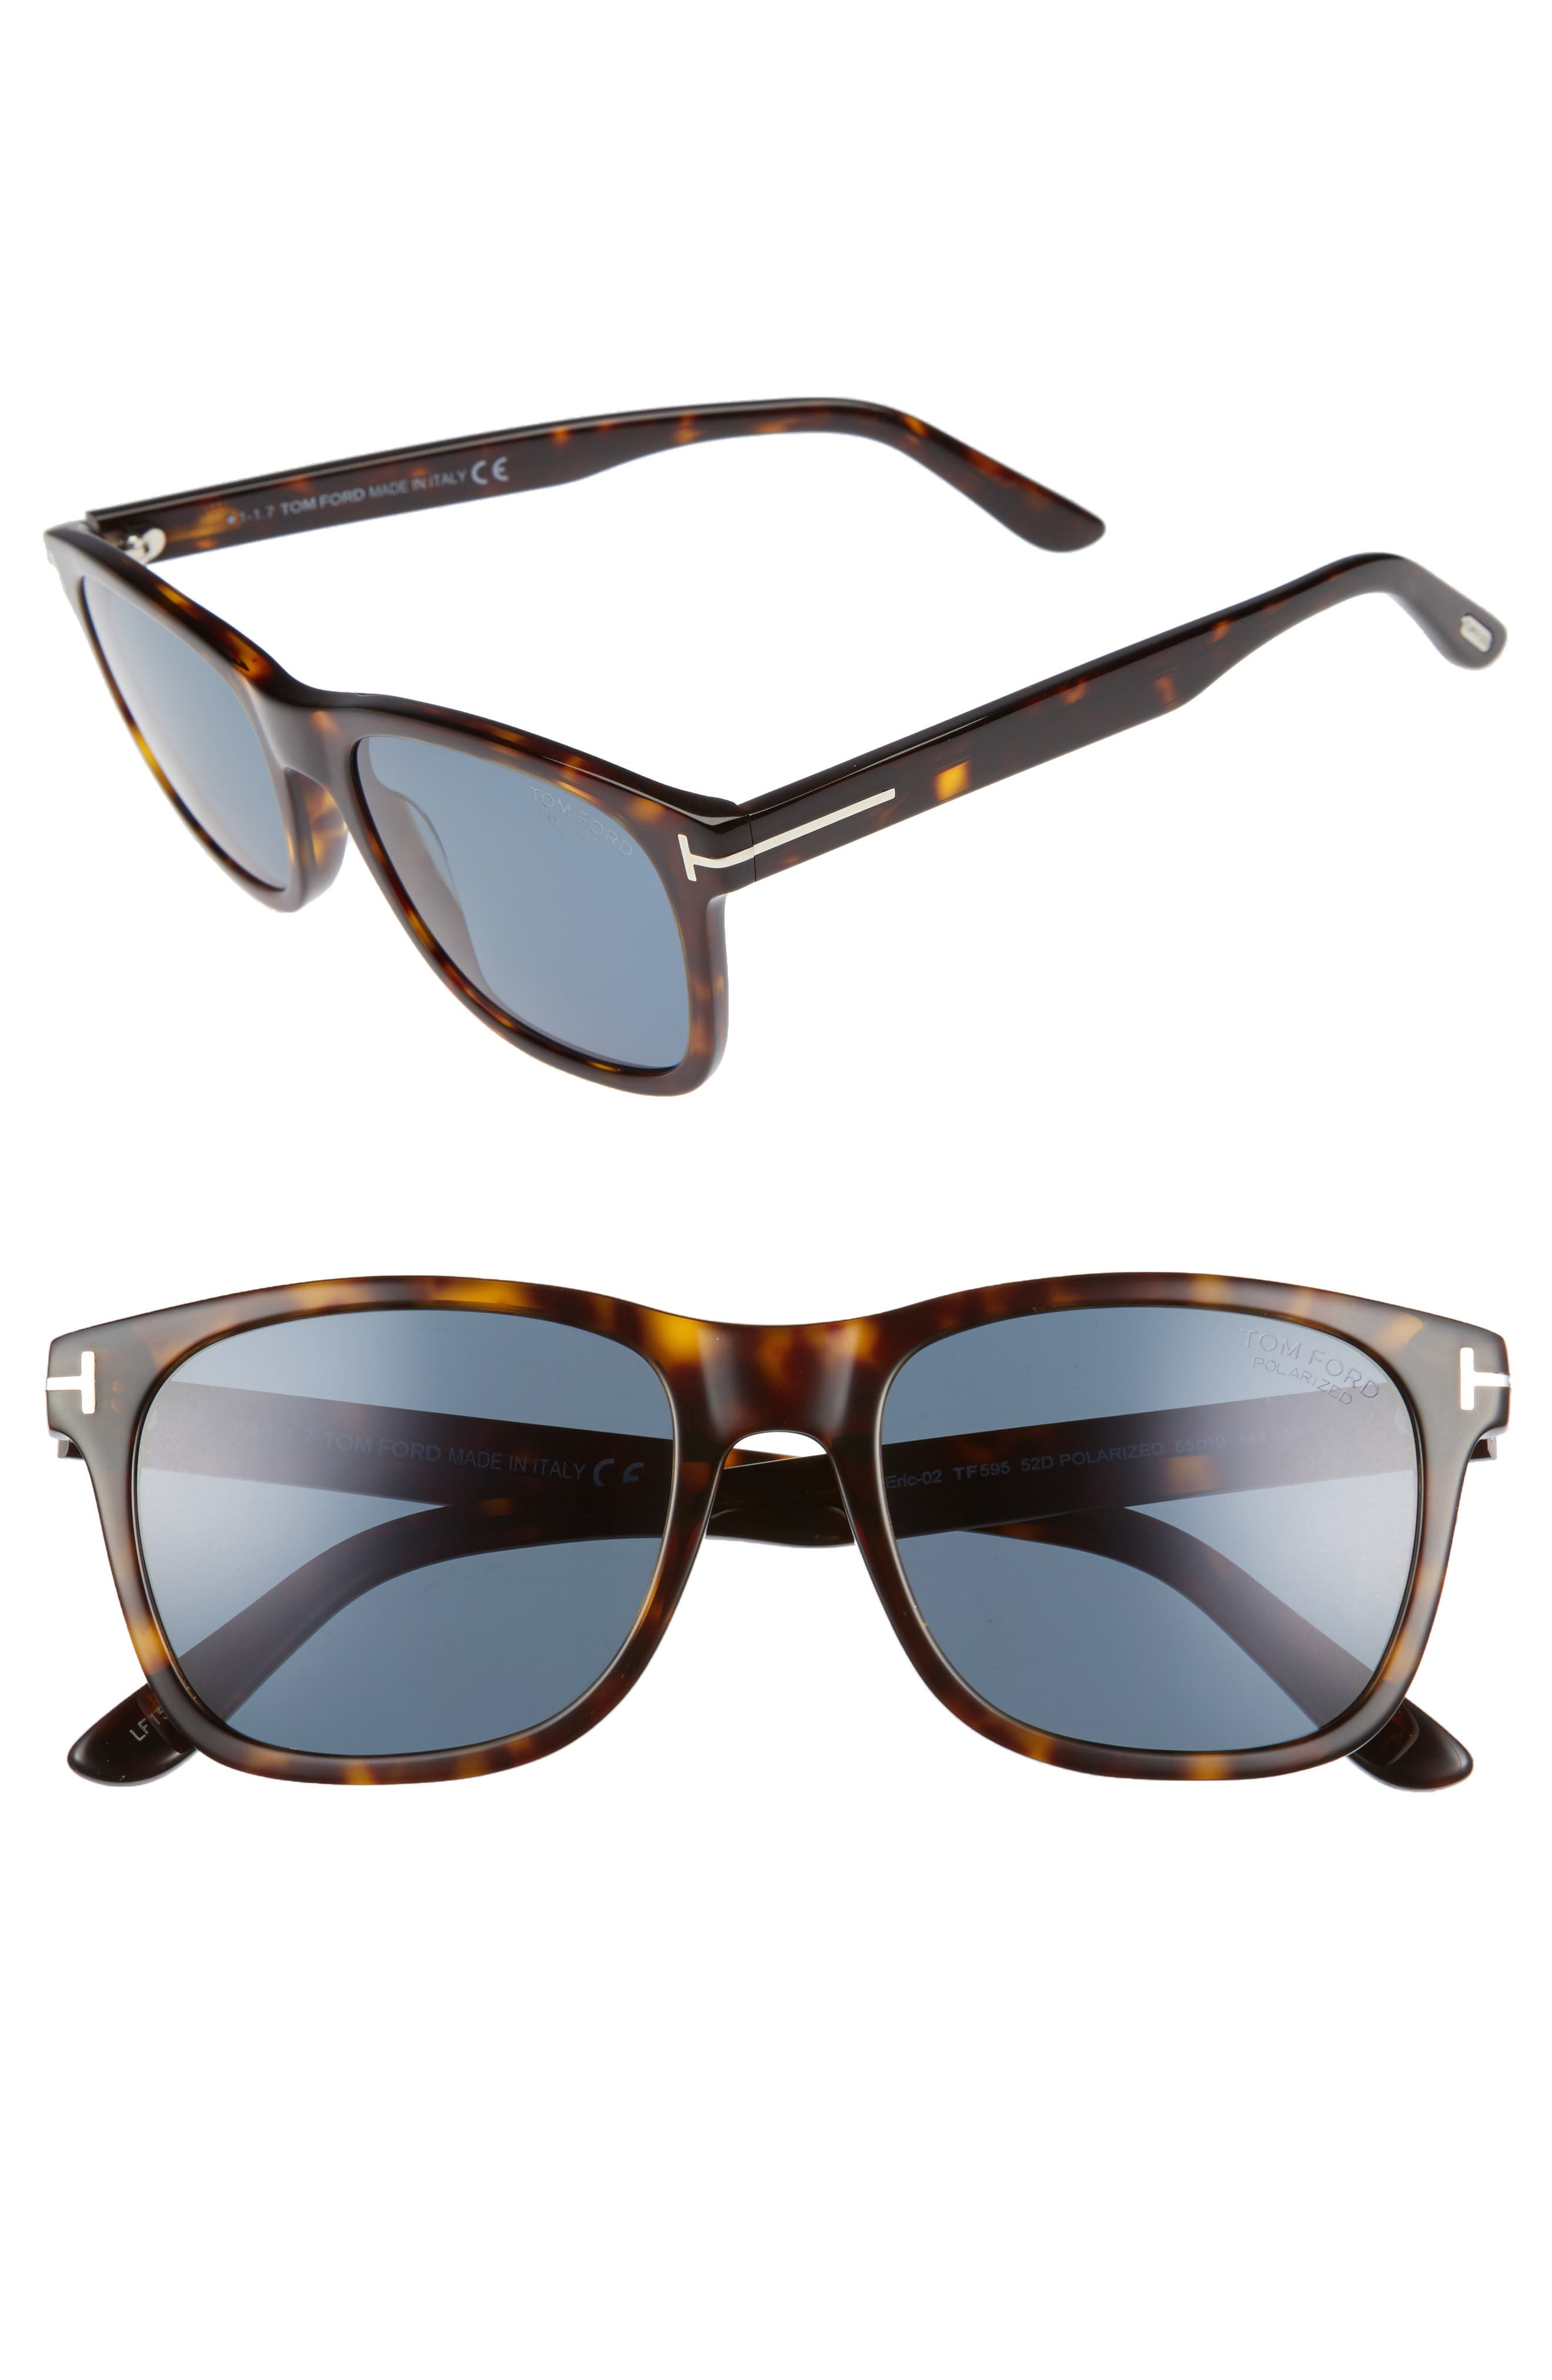 Eric 55mm Polarized Sunglasses,                             Main thumbnail 1, color,                             200